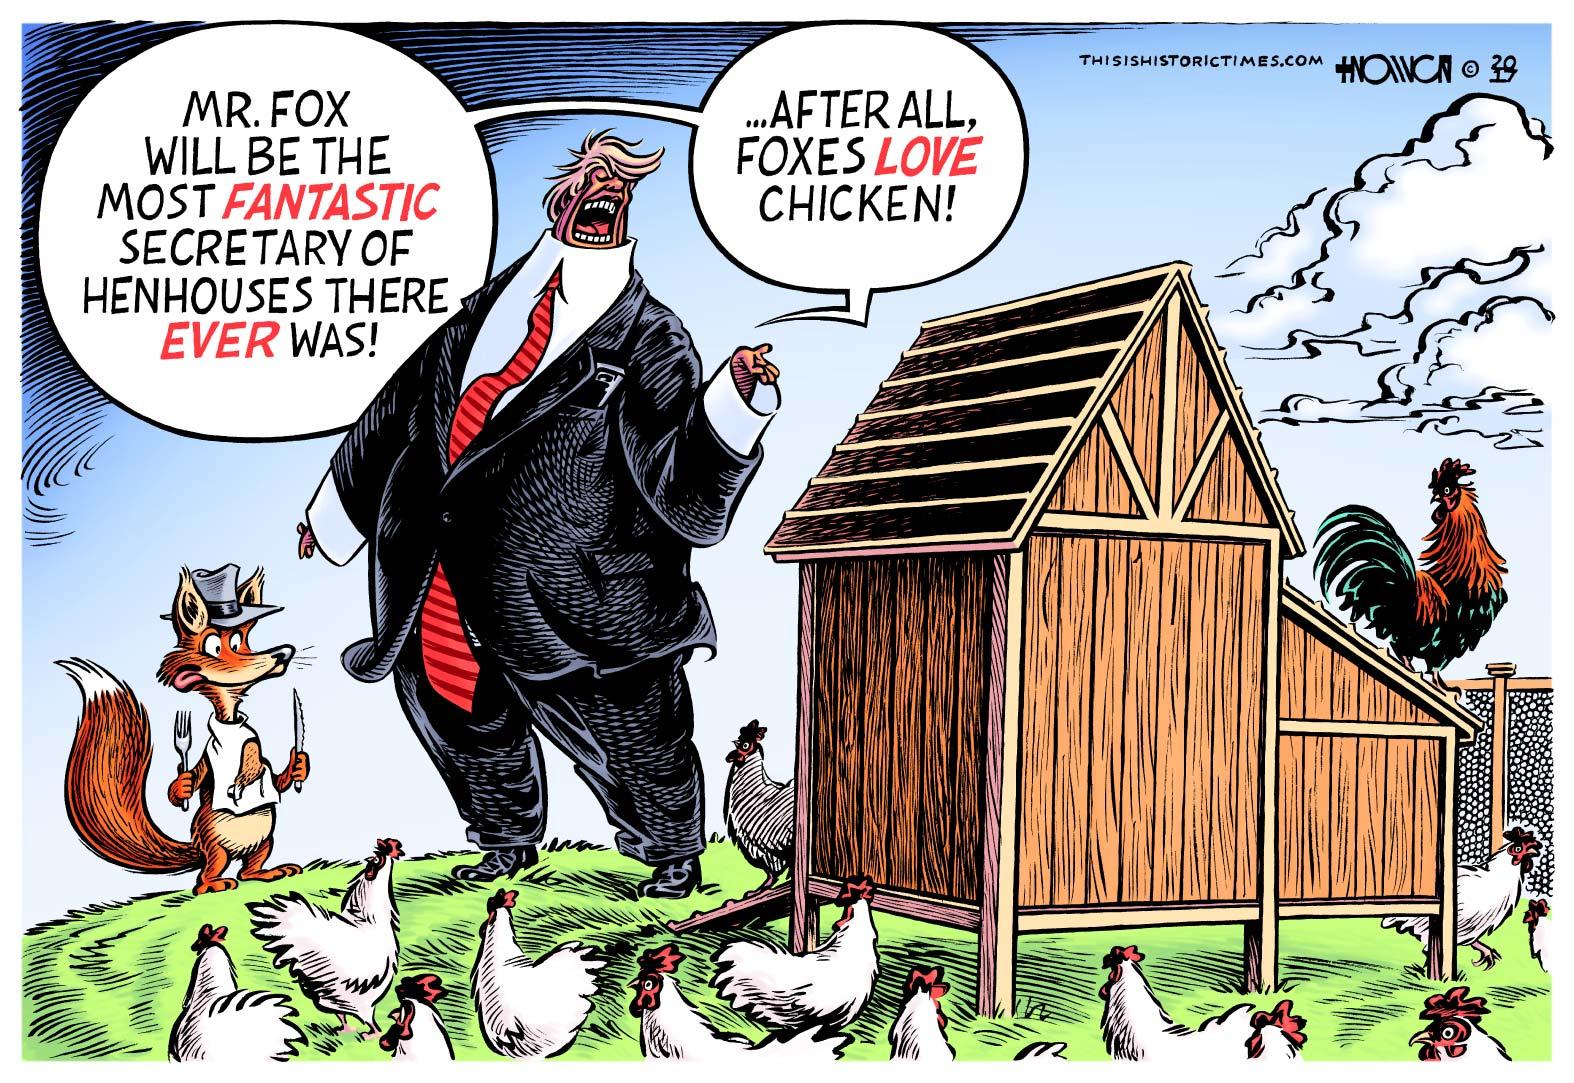 The Fantastic Mr. Fox